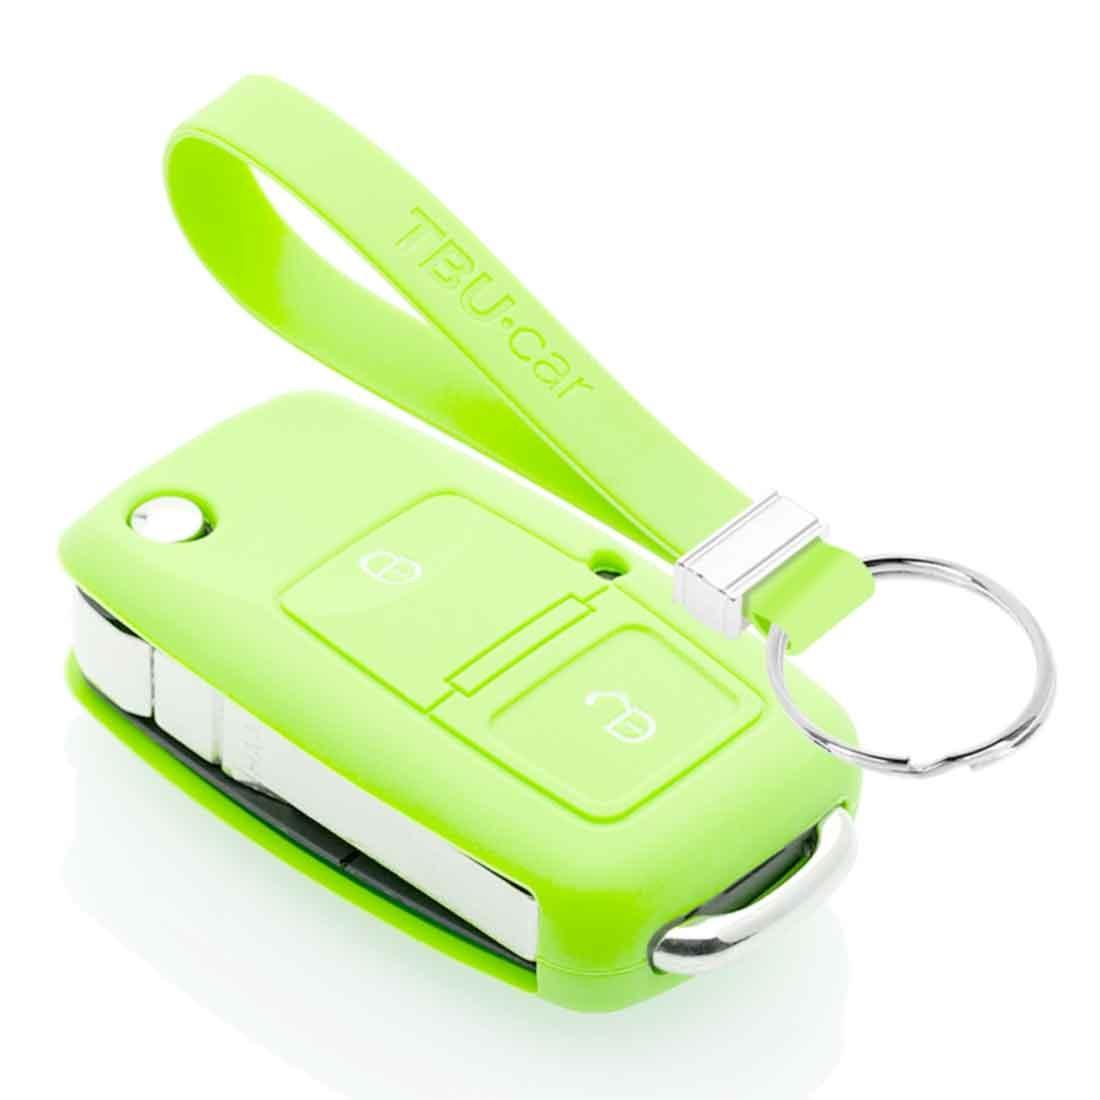 TBU car TBU car Autoschlüssel Hülle kompatibel mit Audi 2 Tasten - Schutzhülle aus Silikon - Auto Schlüsselhülle Cover in Im Dunkeln leuchten